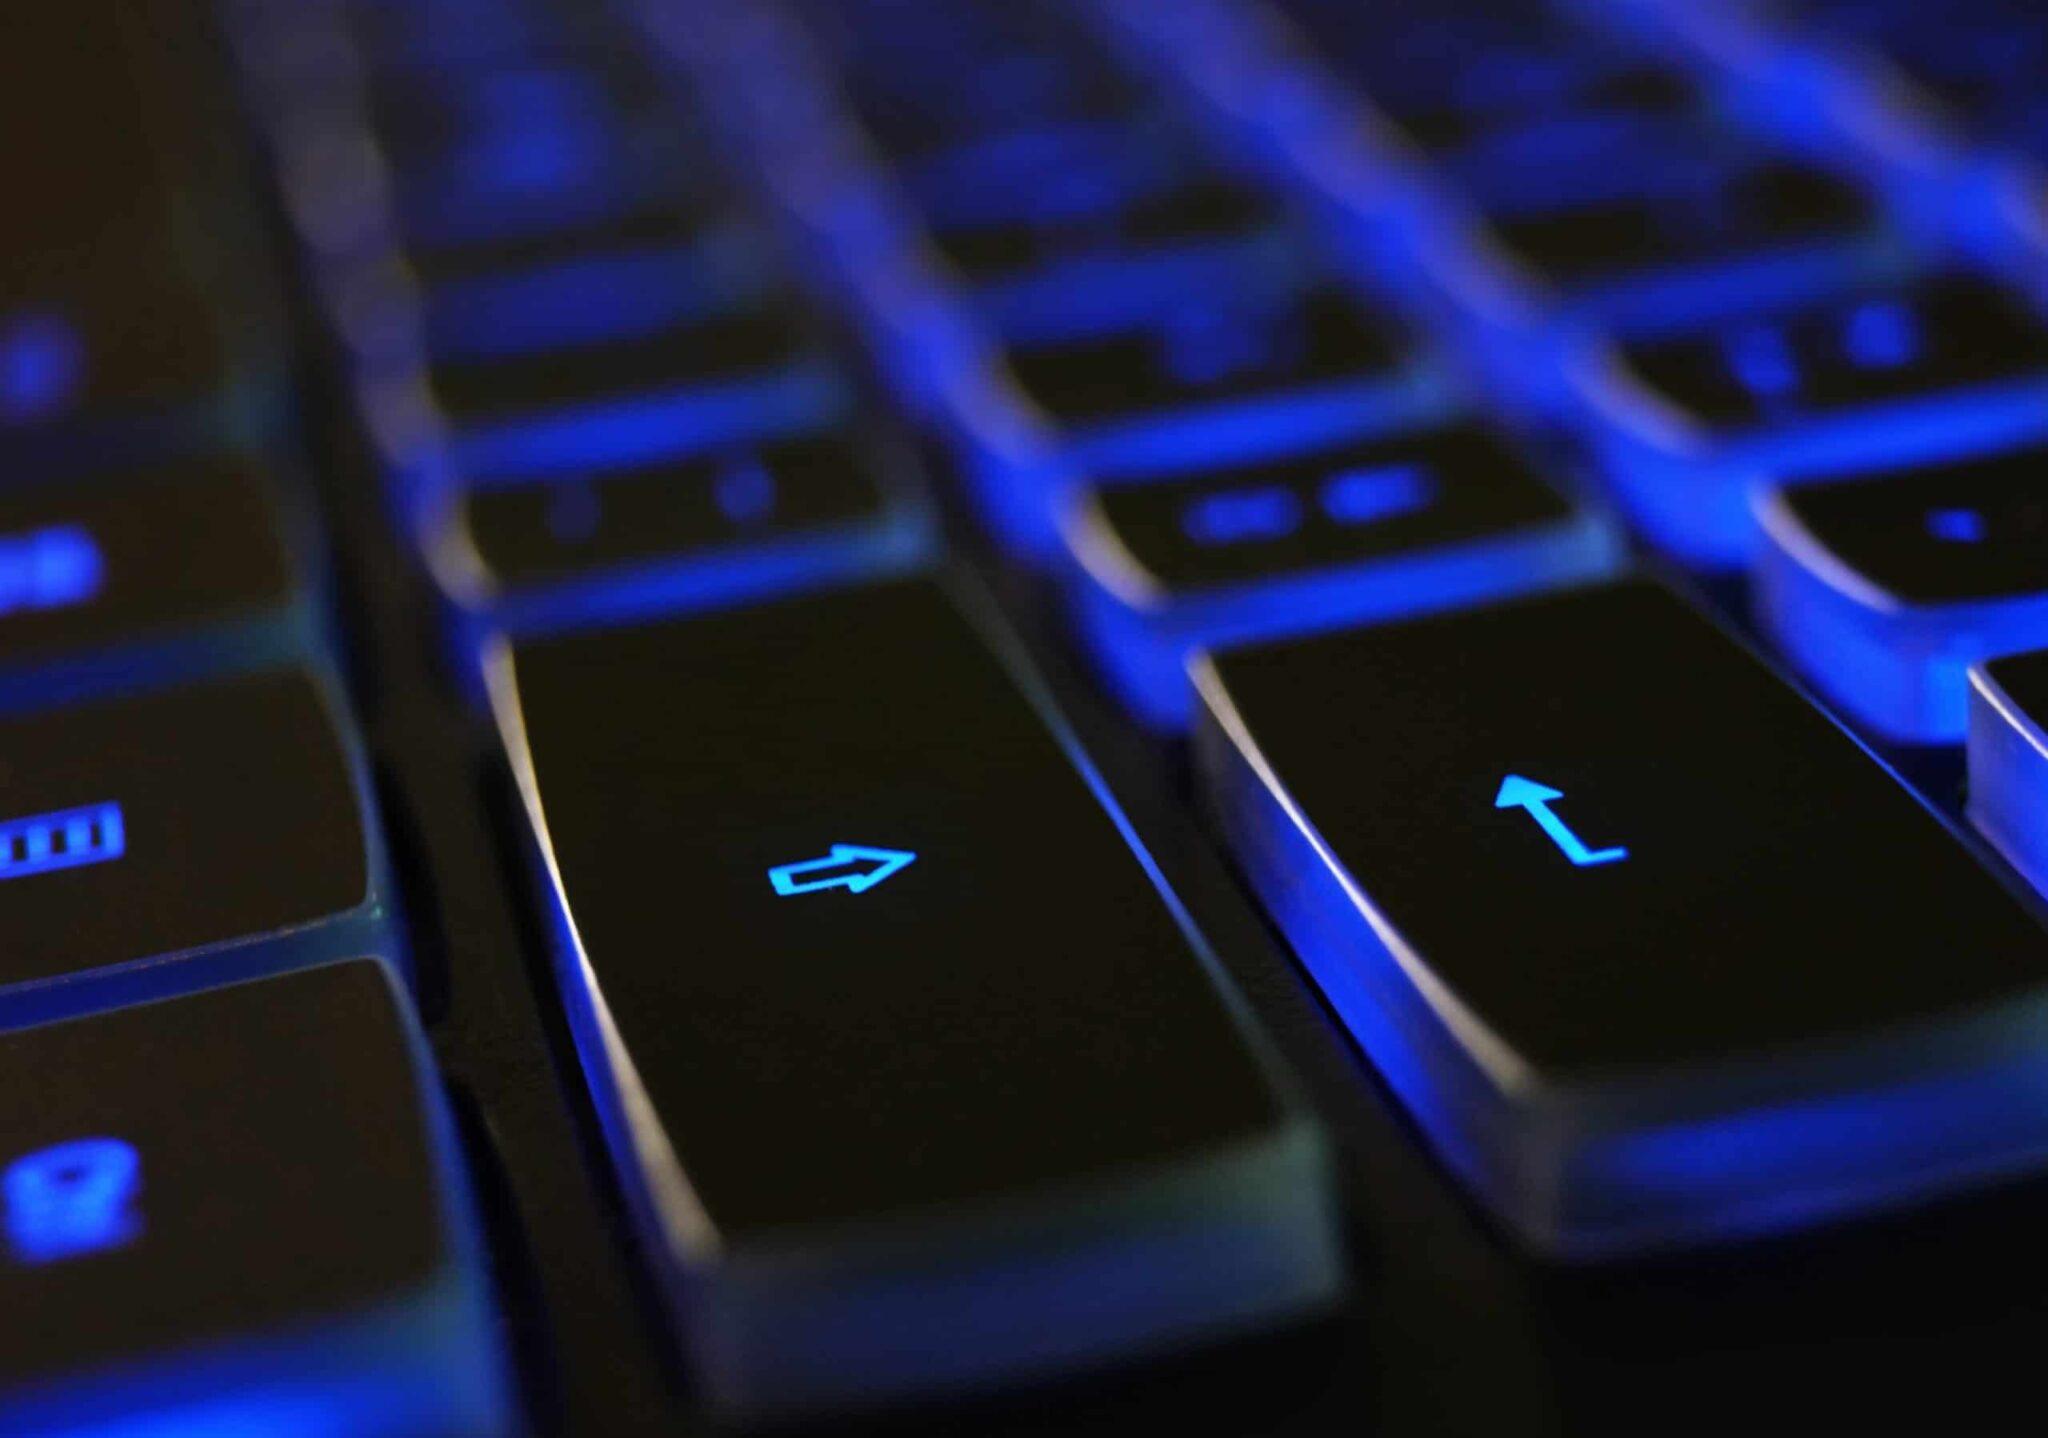 Biden, Gates, Bezos, other Twitter accounts hacked in Bitcoin scam